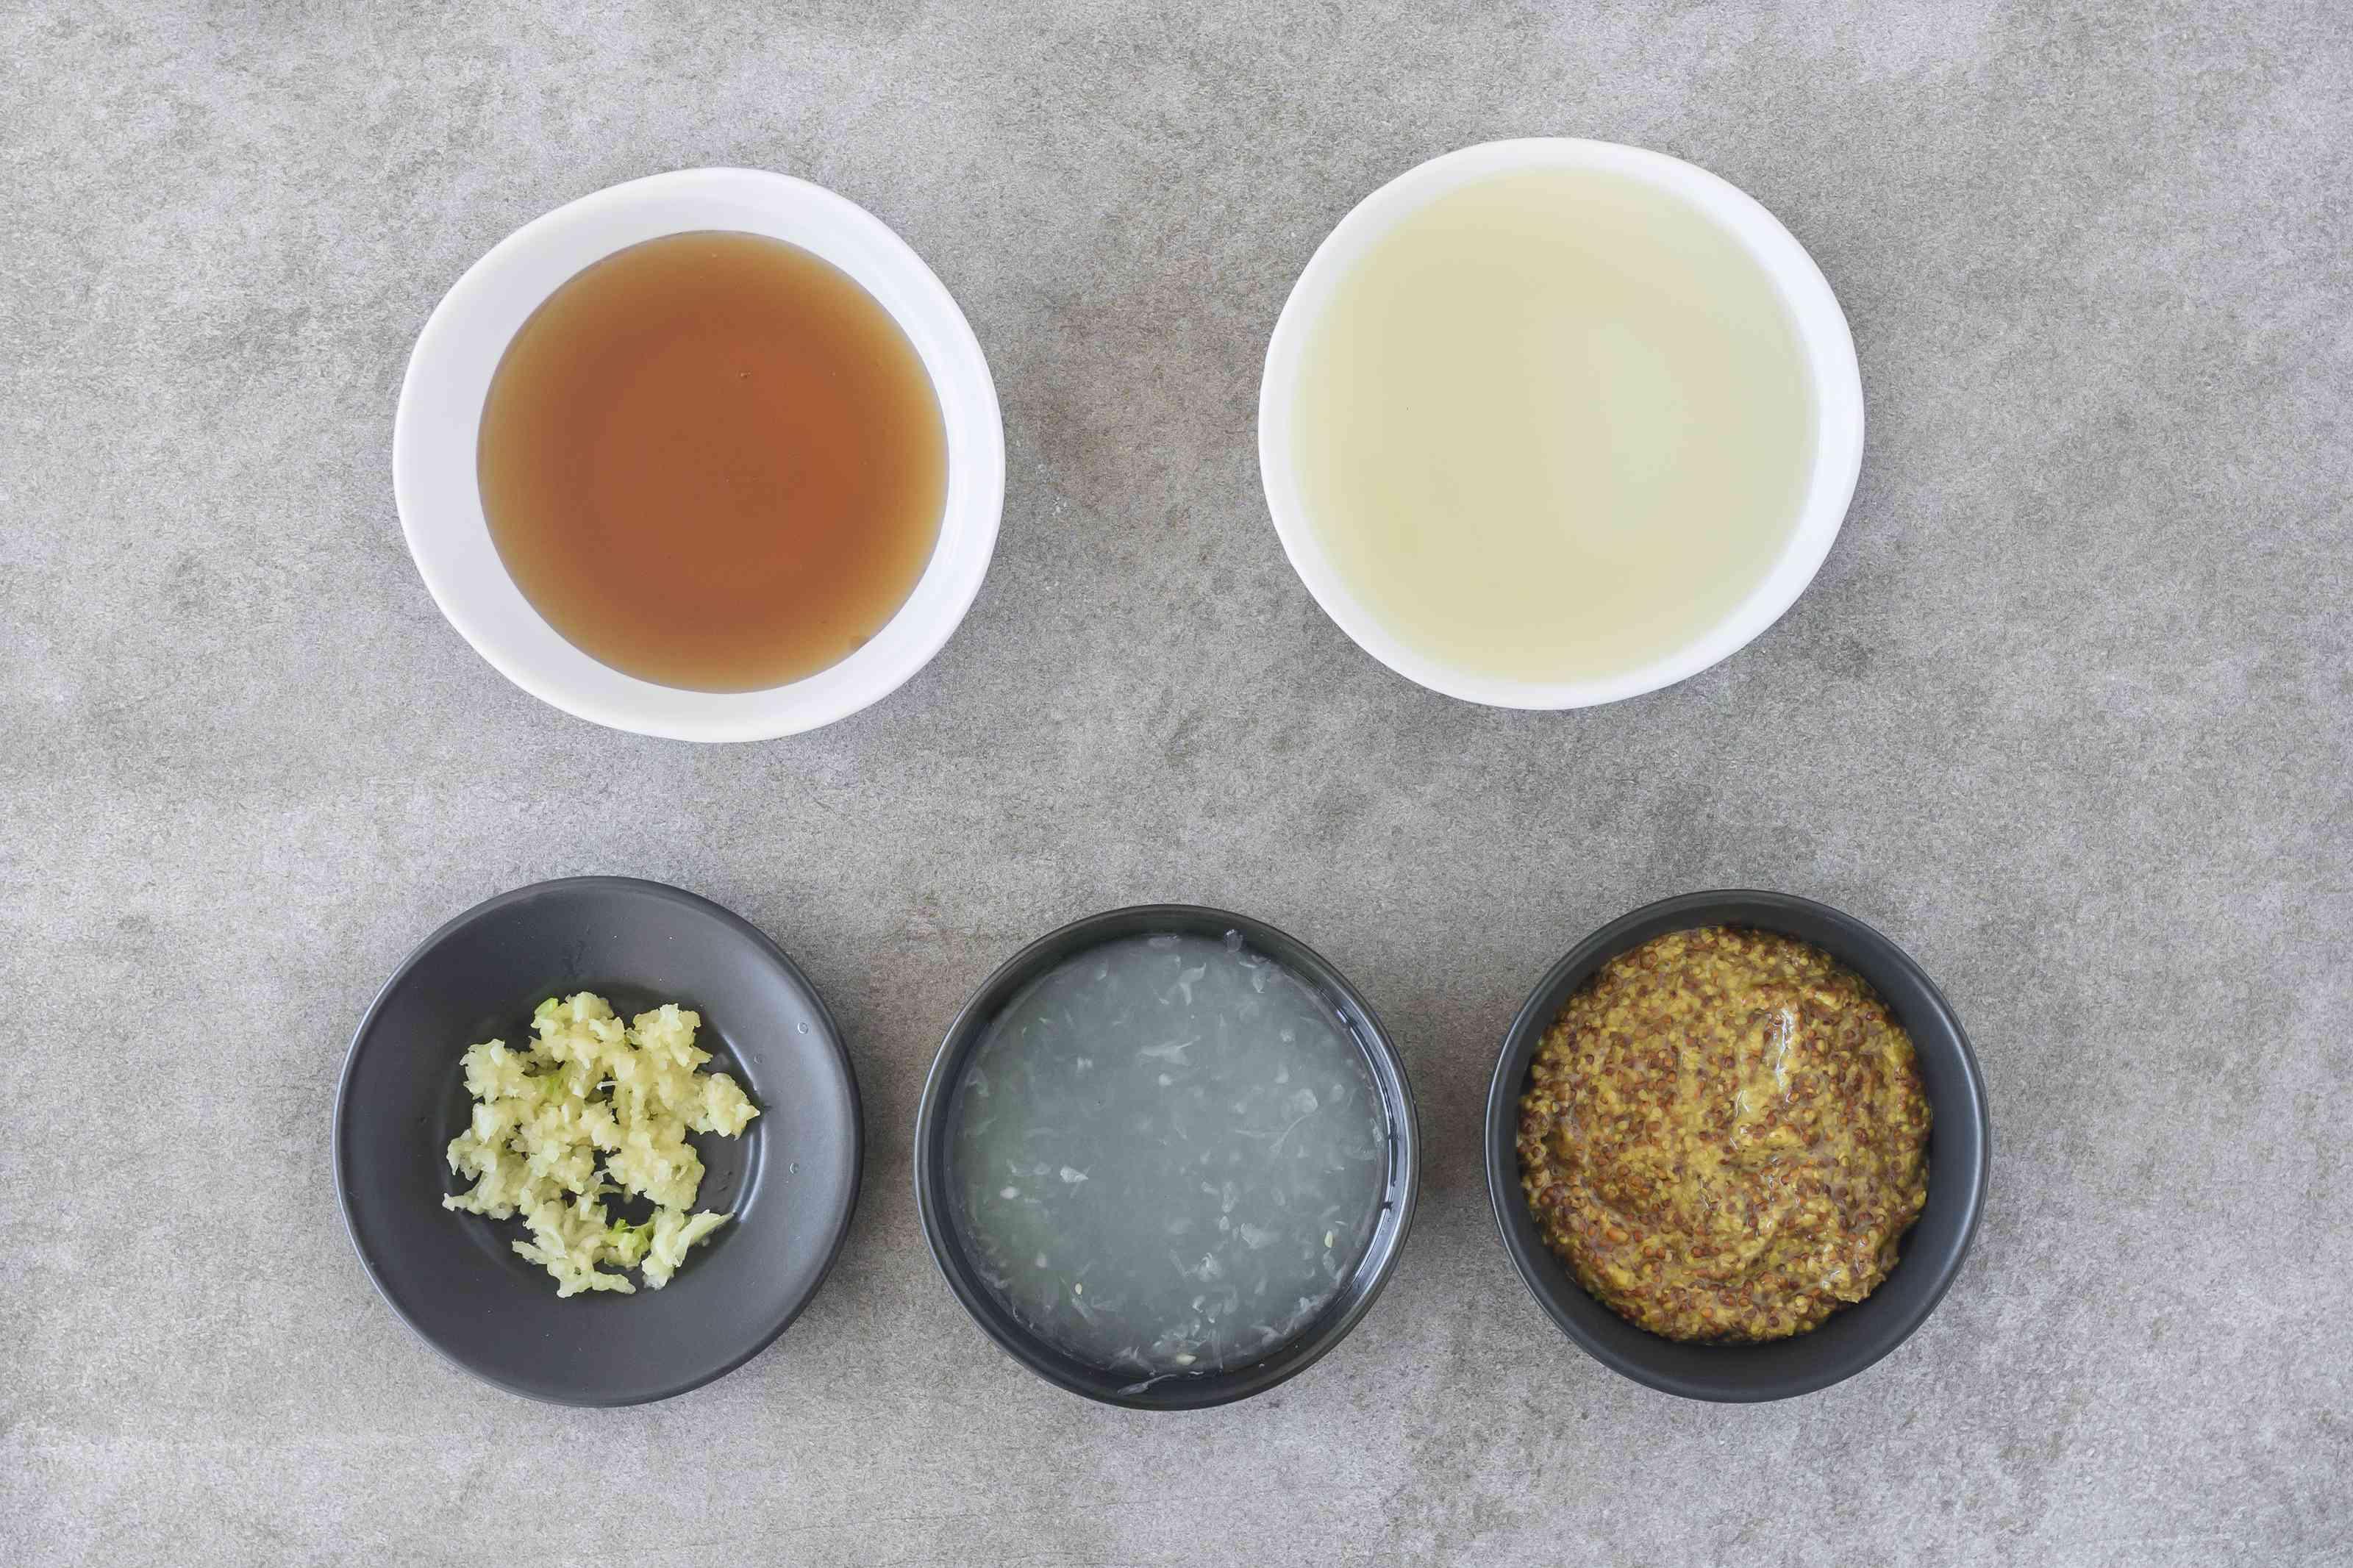 Ingredients for honey mustard turkey marinade